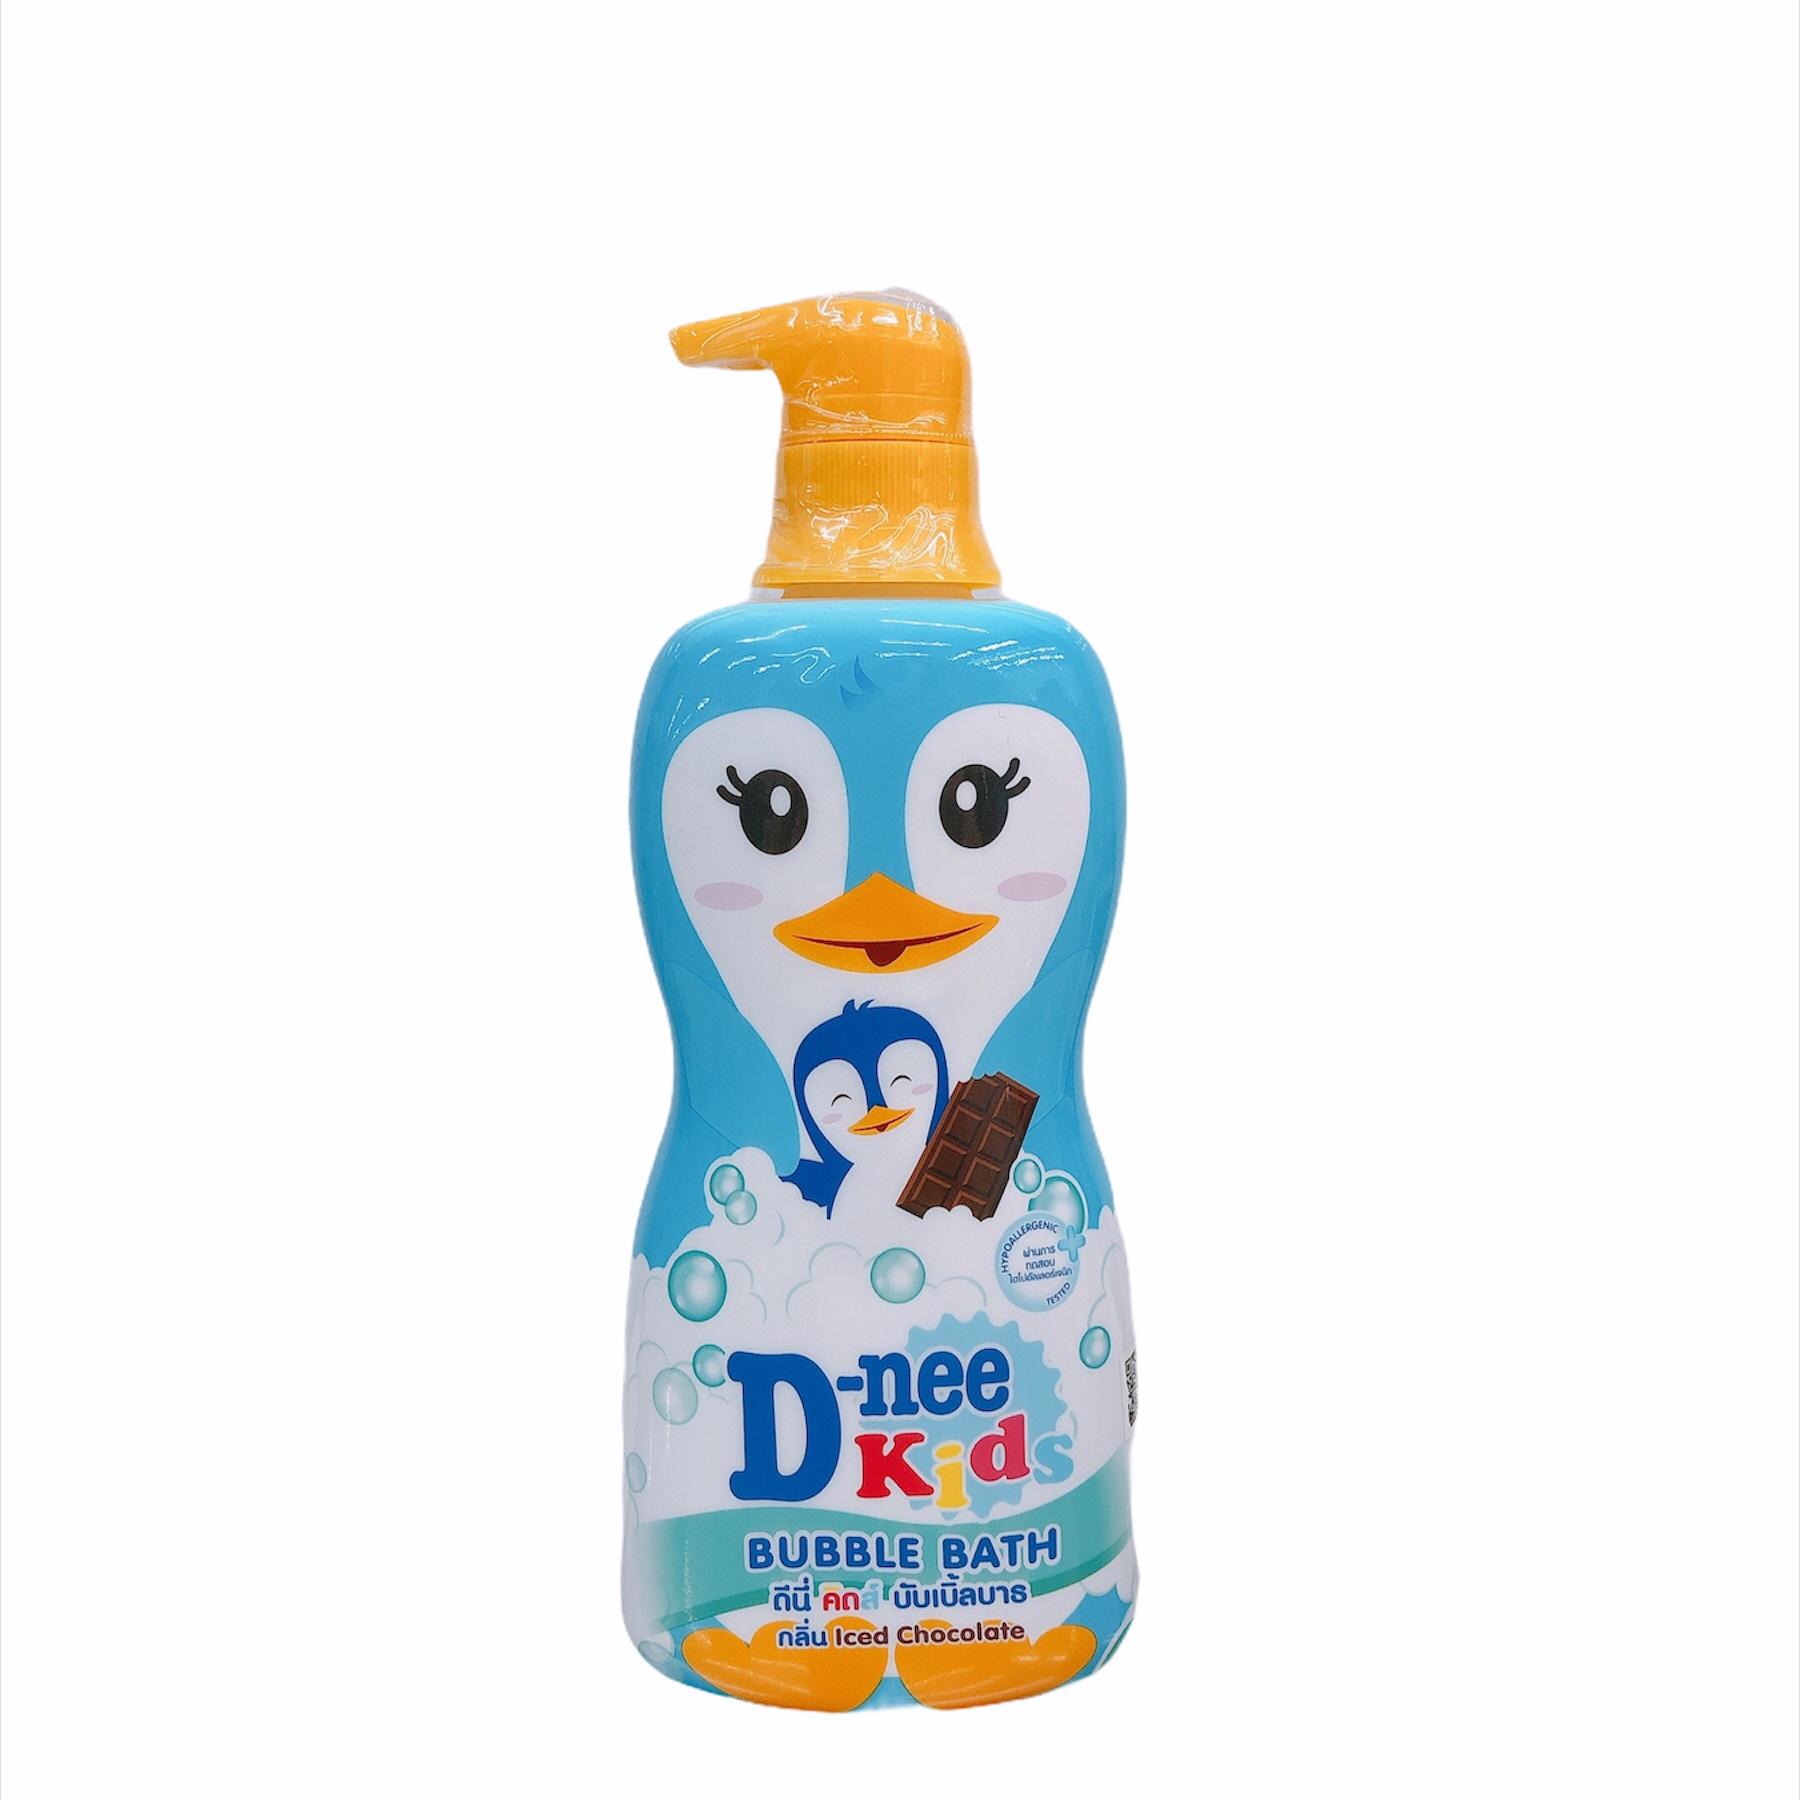 Tắm & Gội Trẻ Em D-nee Kids - Iced Chocolate 400ml